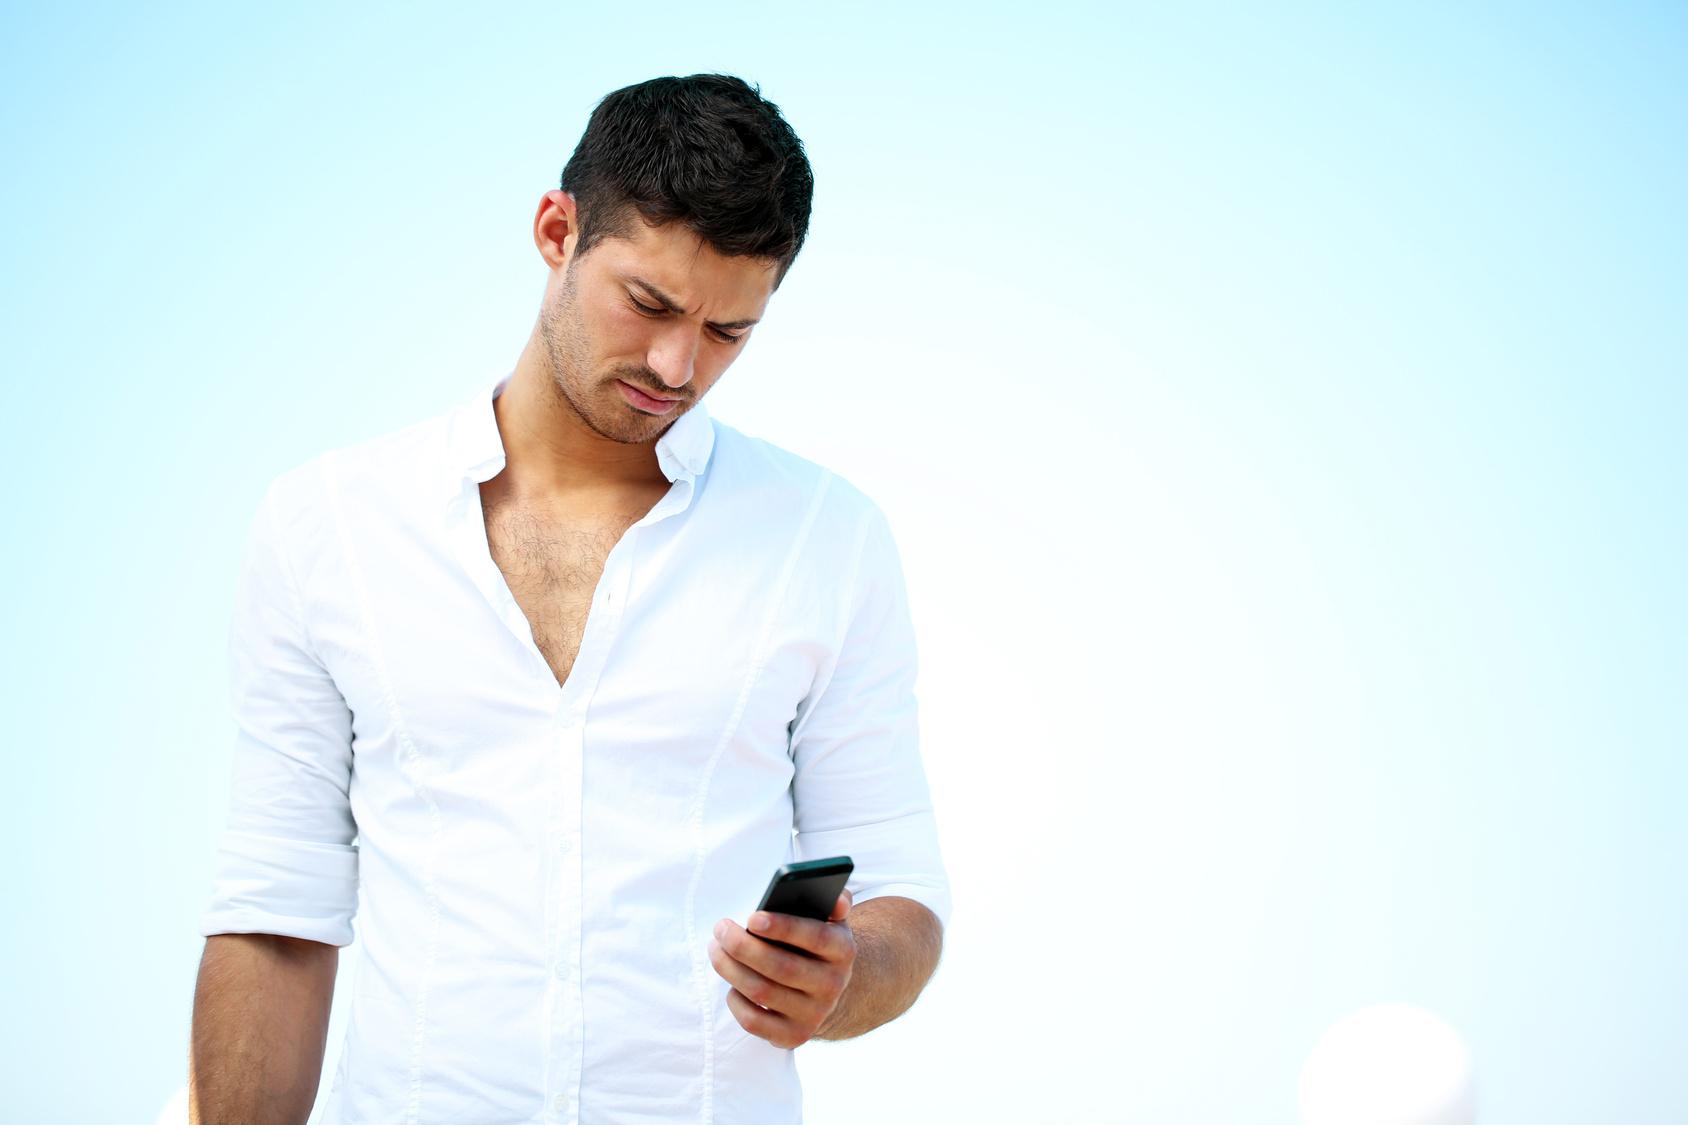 фото ждущего мужчины